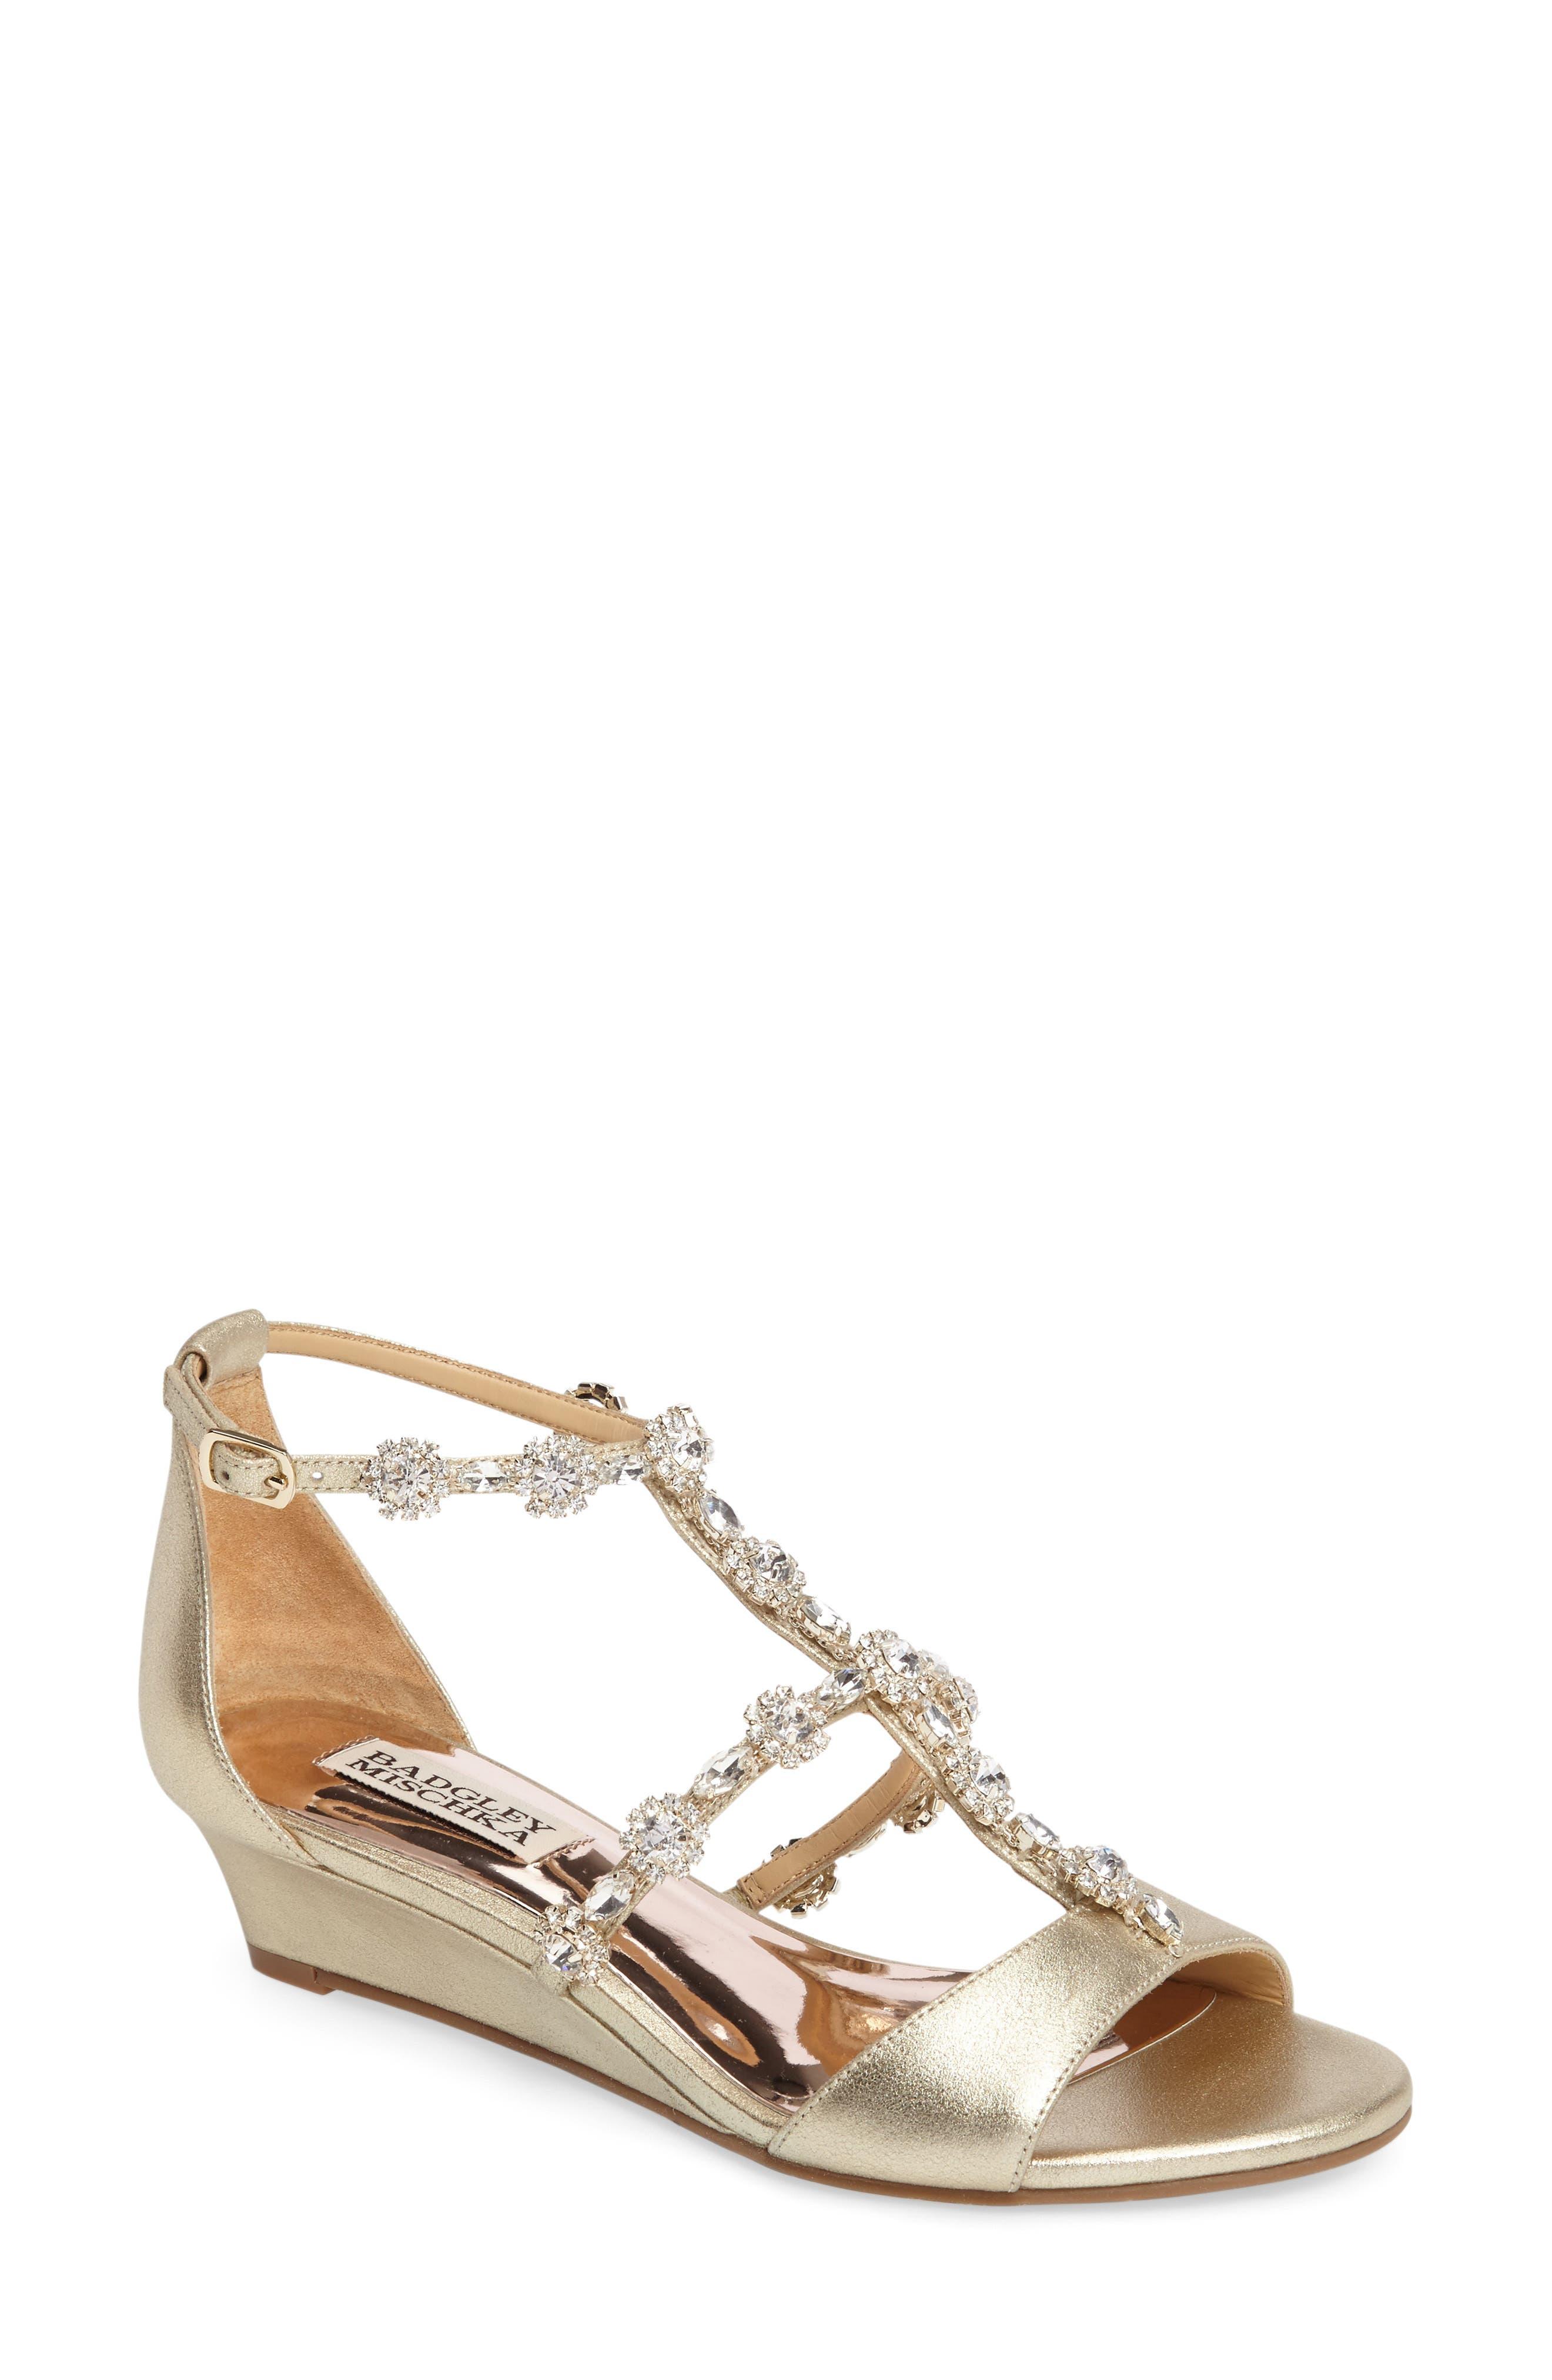 Badgley Mischka Terry II Crystal Embellished Wedge Sandal (Women)